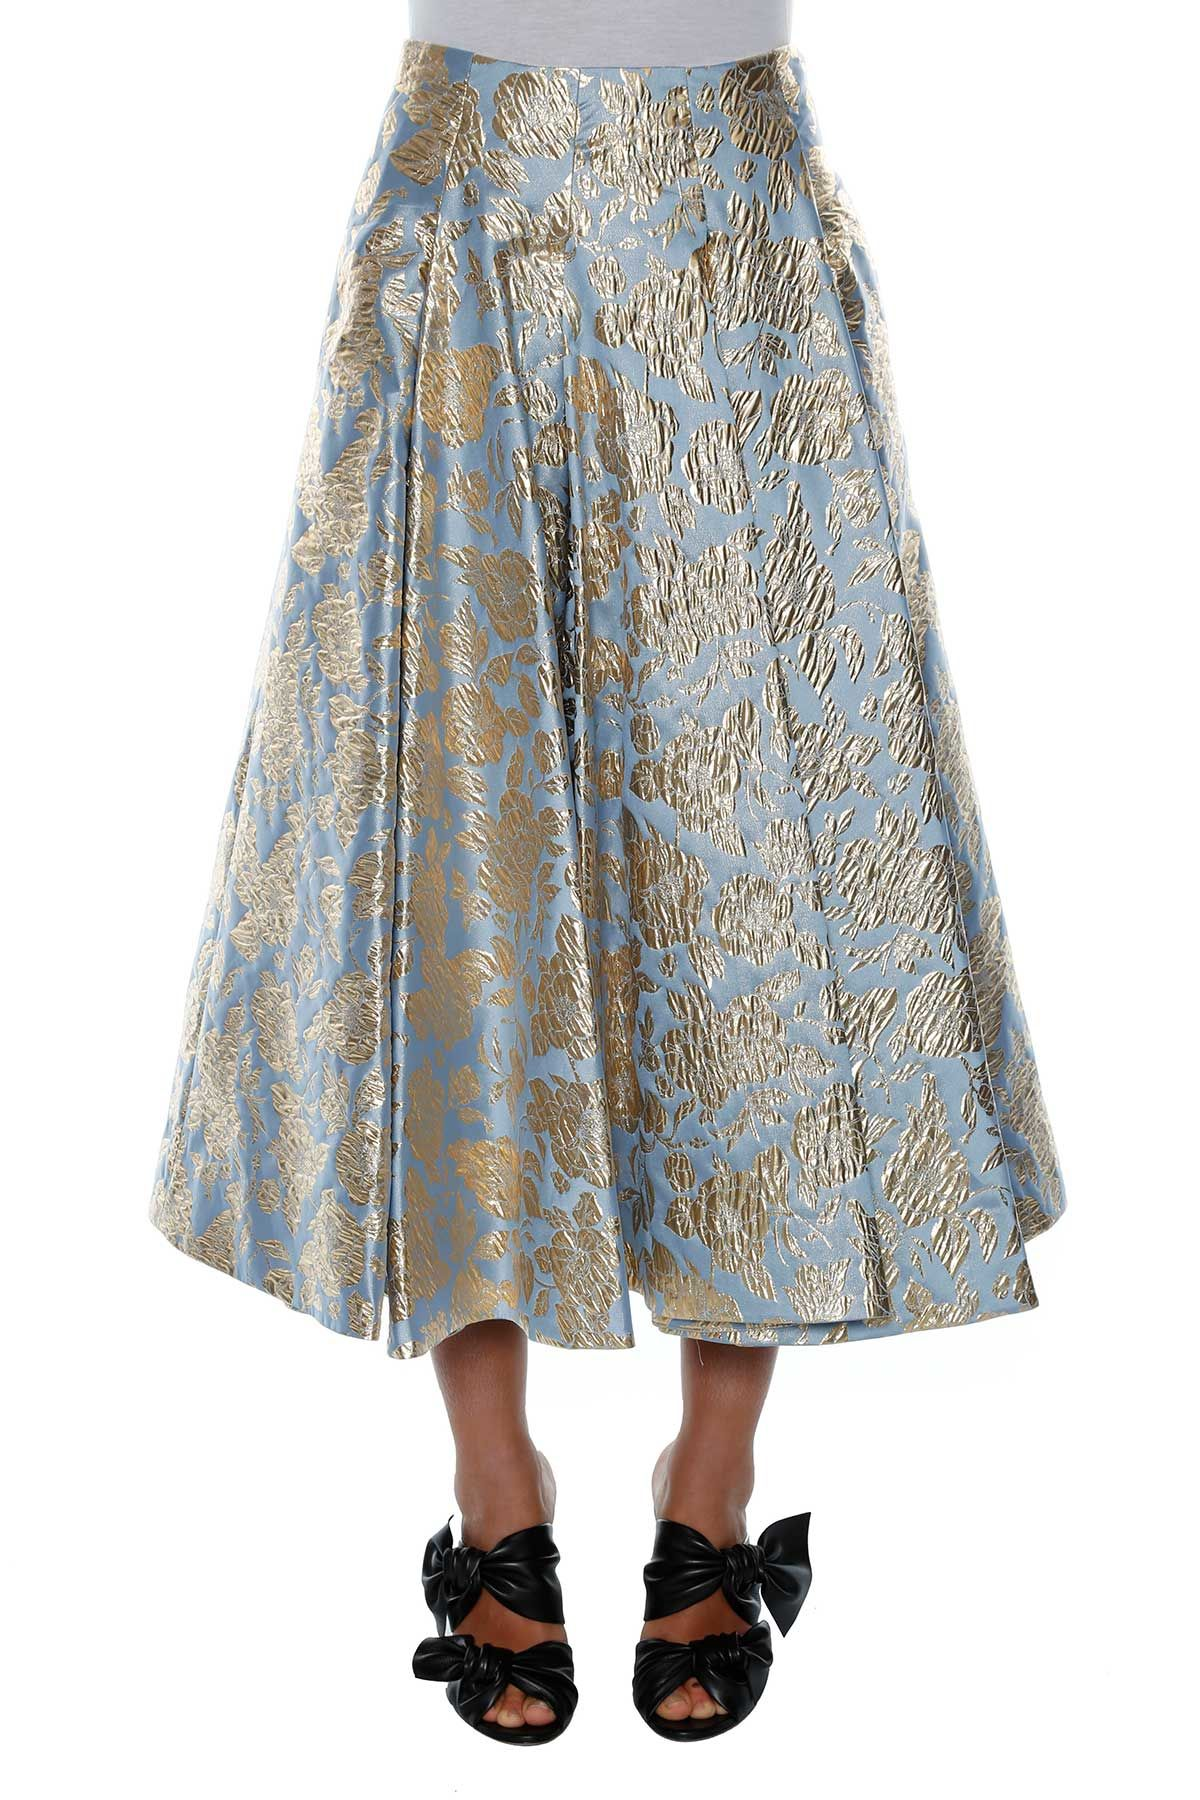 Msgm Jacquard Midi-skirt